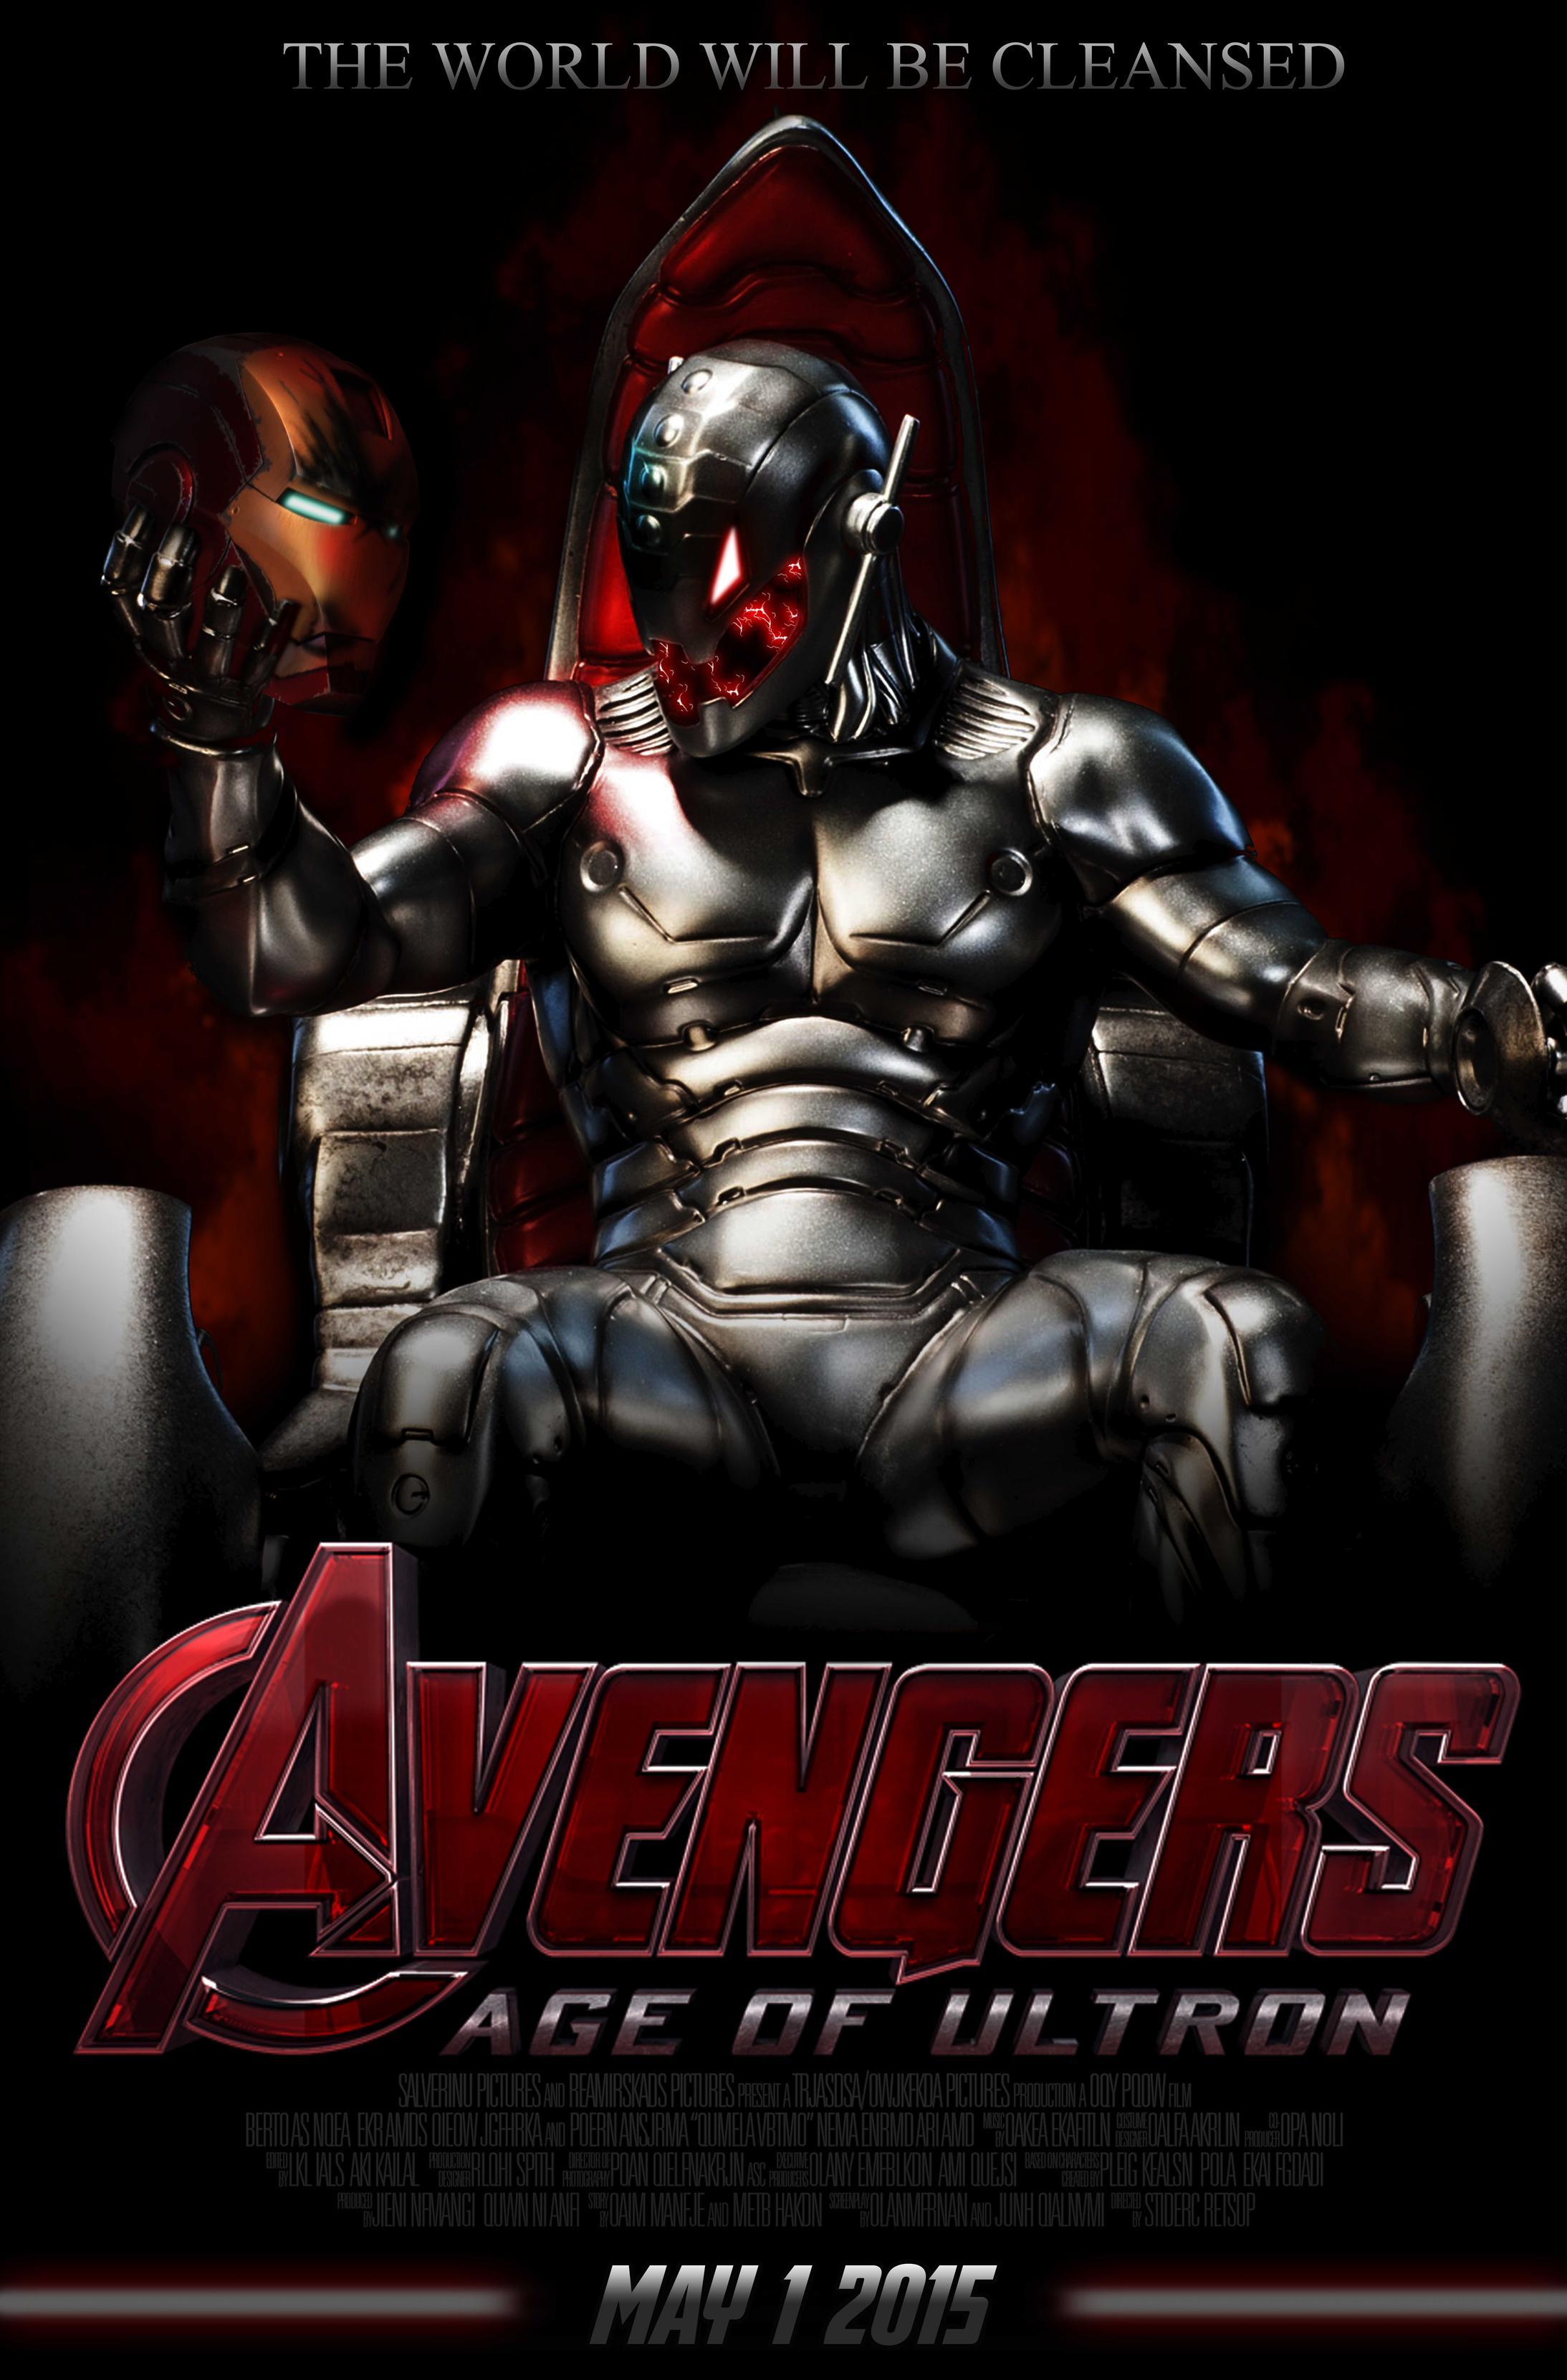 постер Мстители: Эра Альтрона,Avengers: Age of Ultron